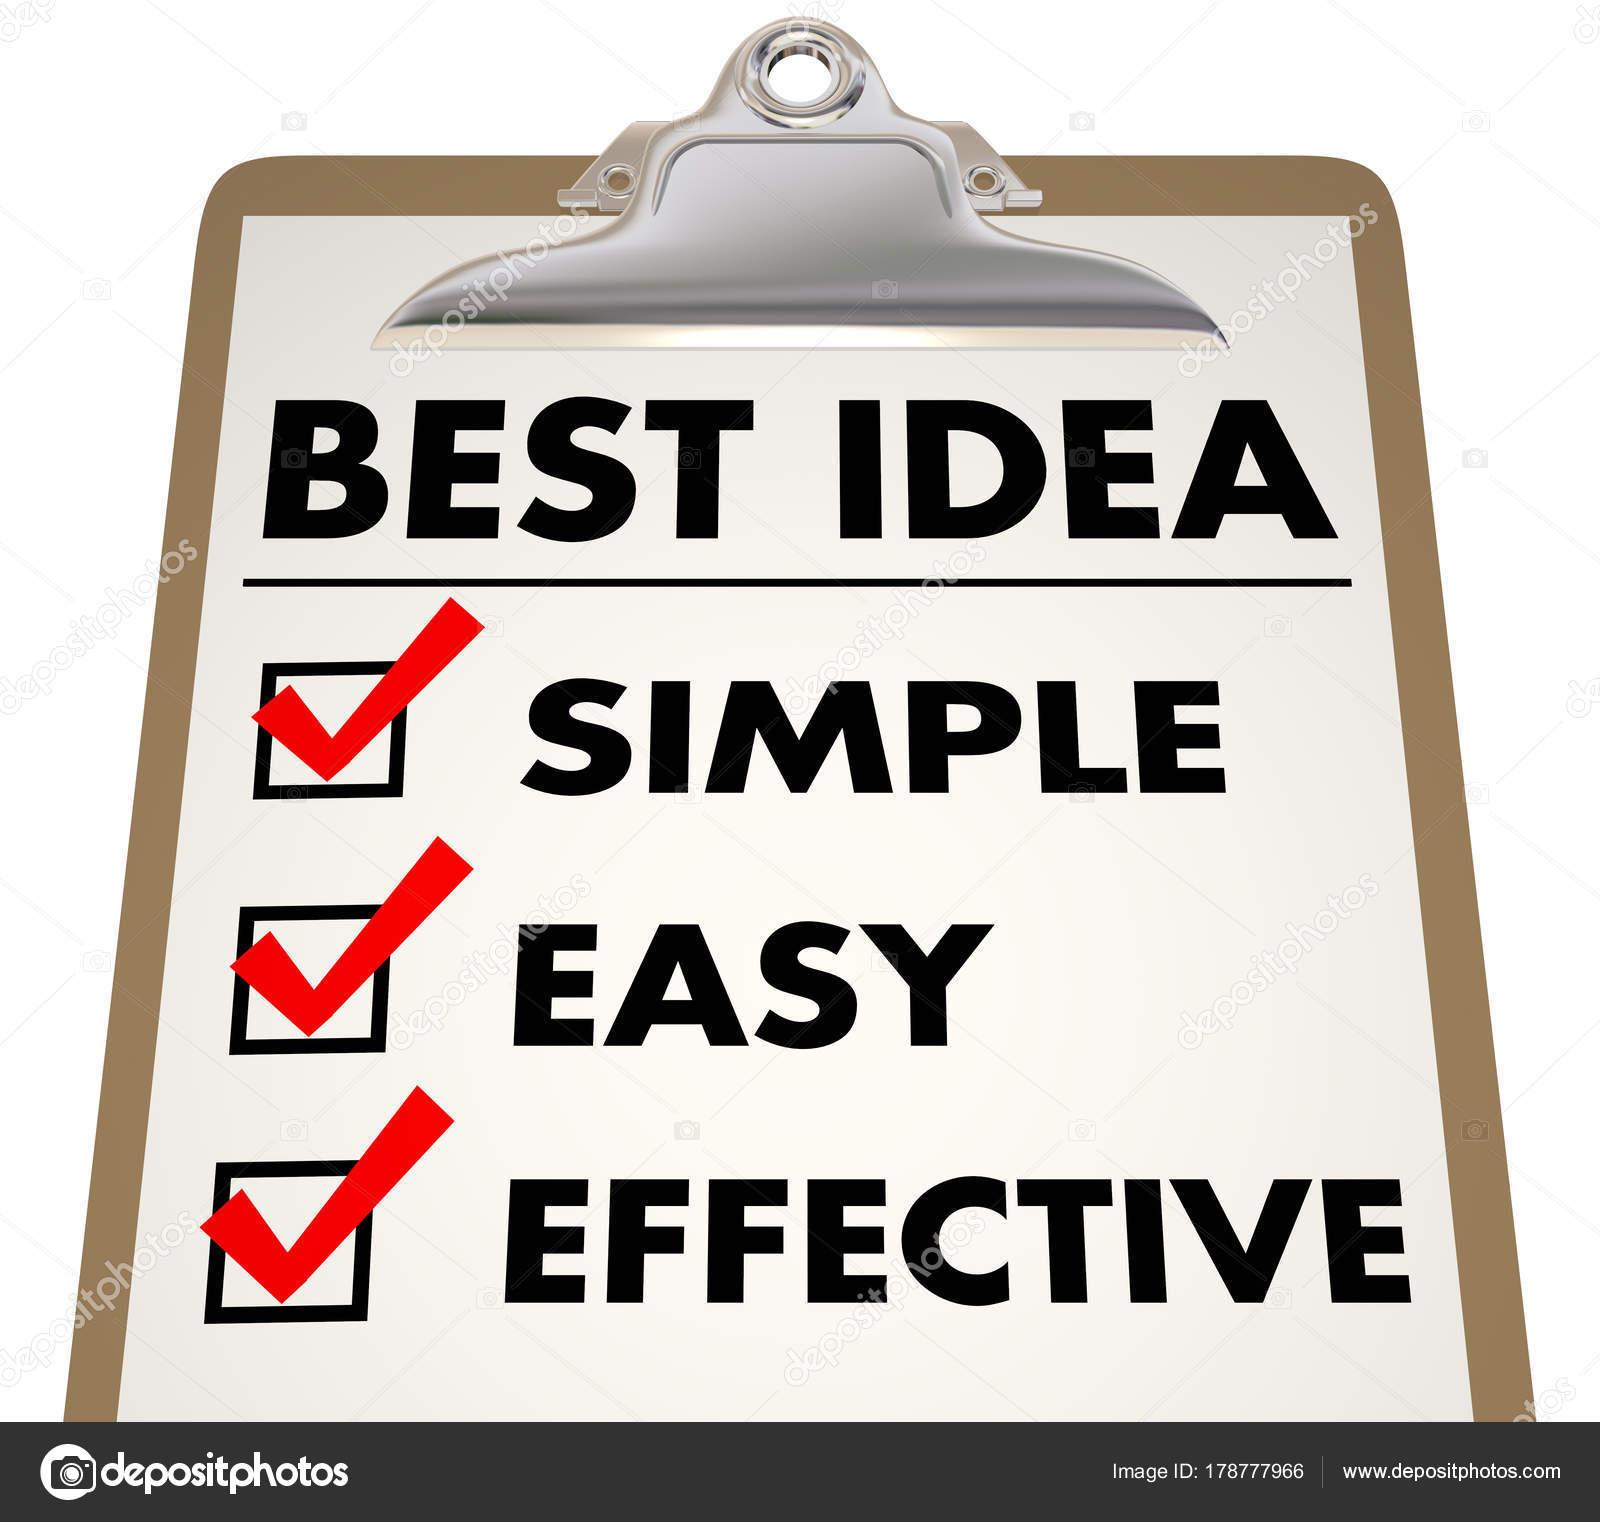 Meilleure Idée Simple Facile Efficace